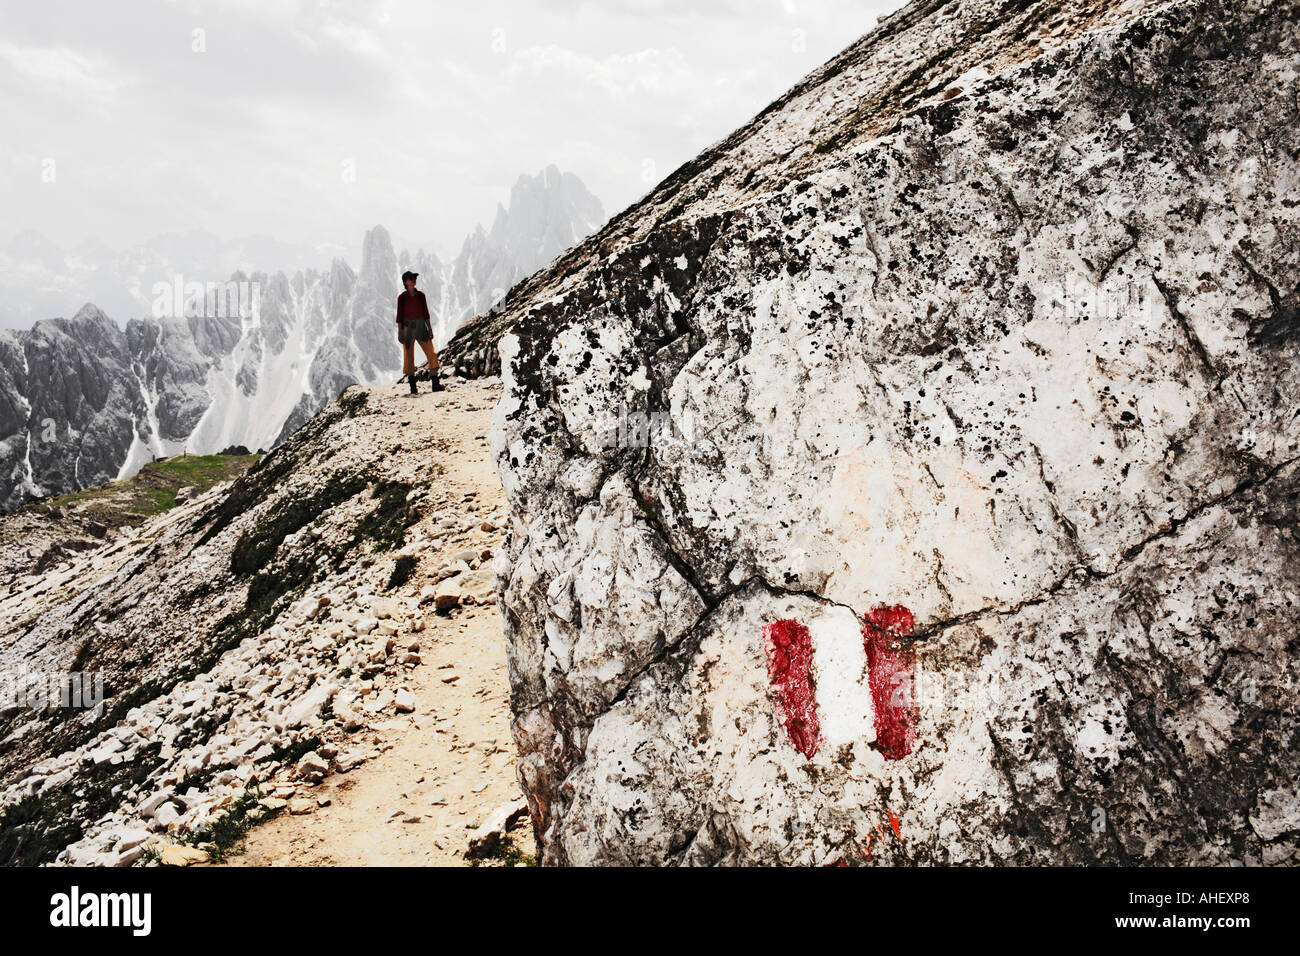 Mountain Climber Looking Up Slope Dolomites Tre Cime Three Peaks Alps Italy - Stock Image